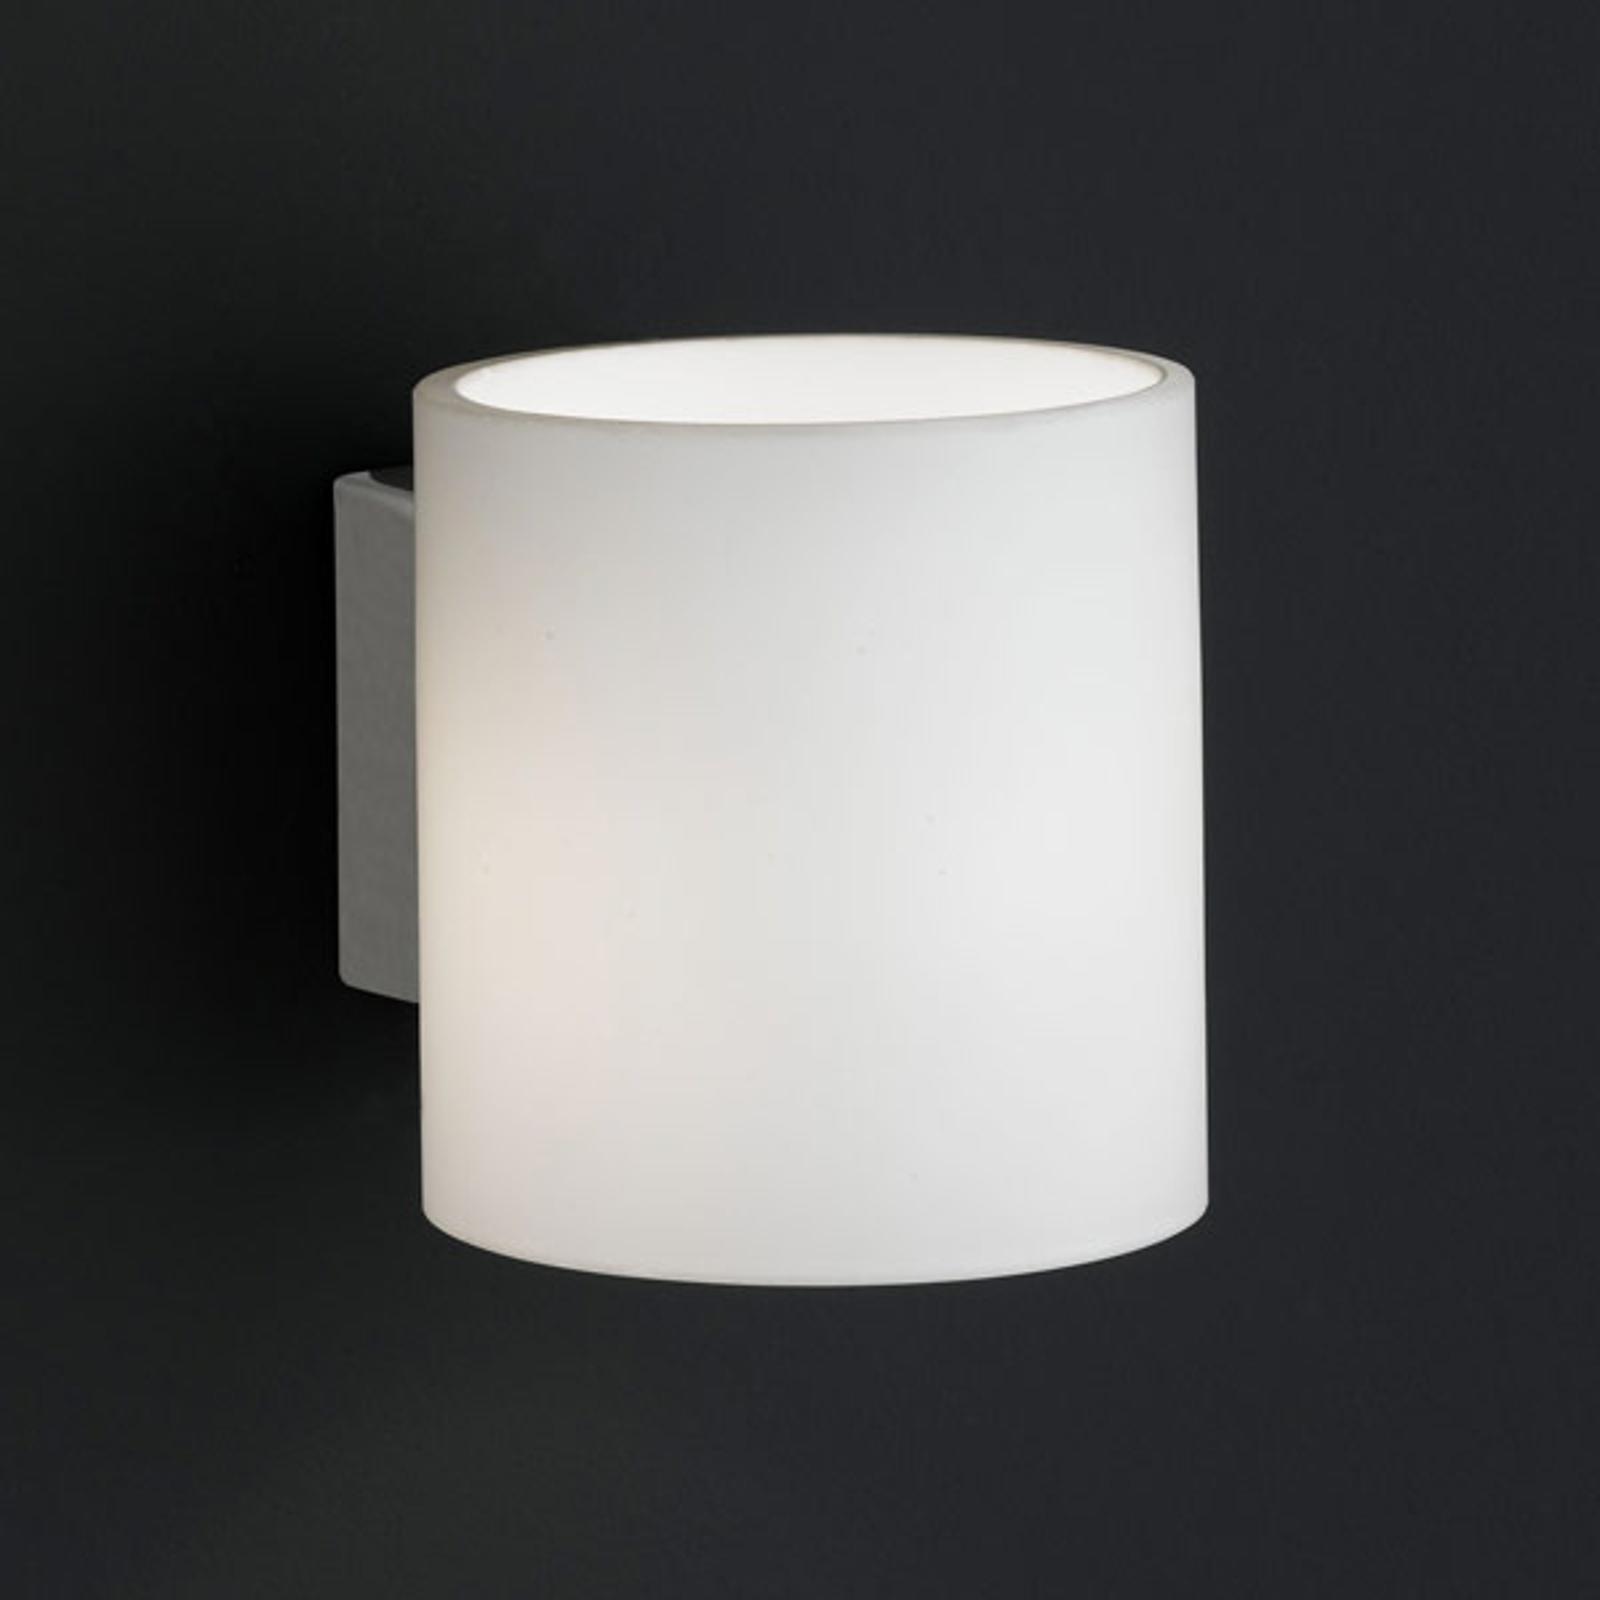 Wandlamp Aquaba met tuimelschakelaar